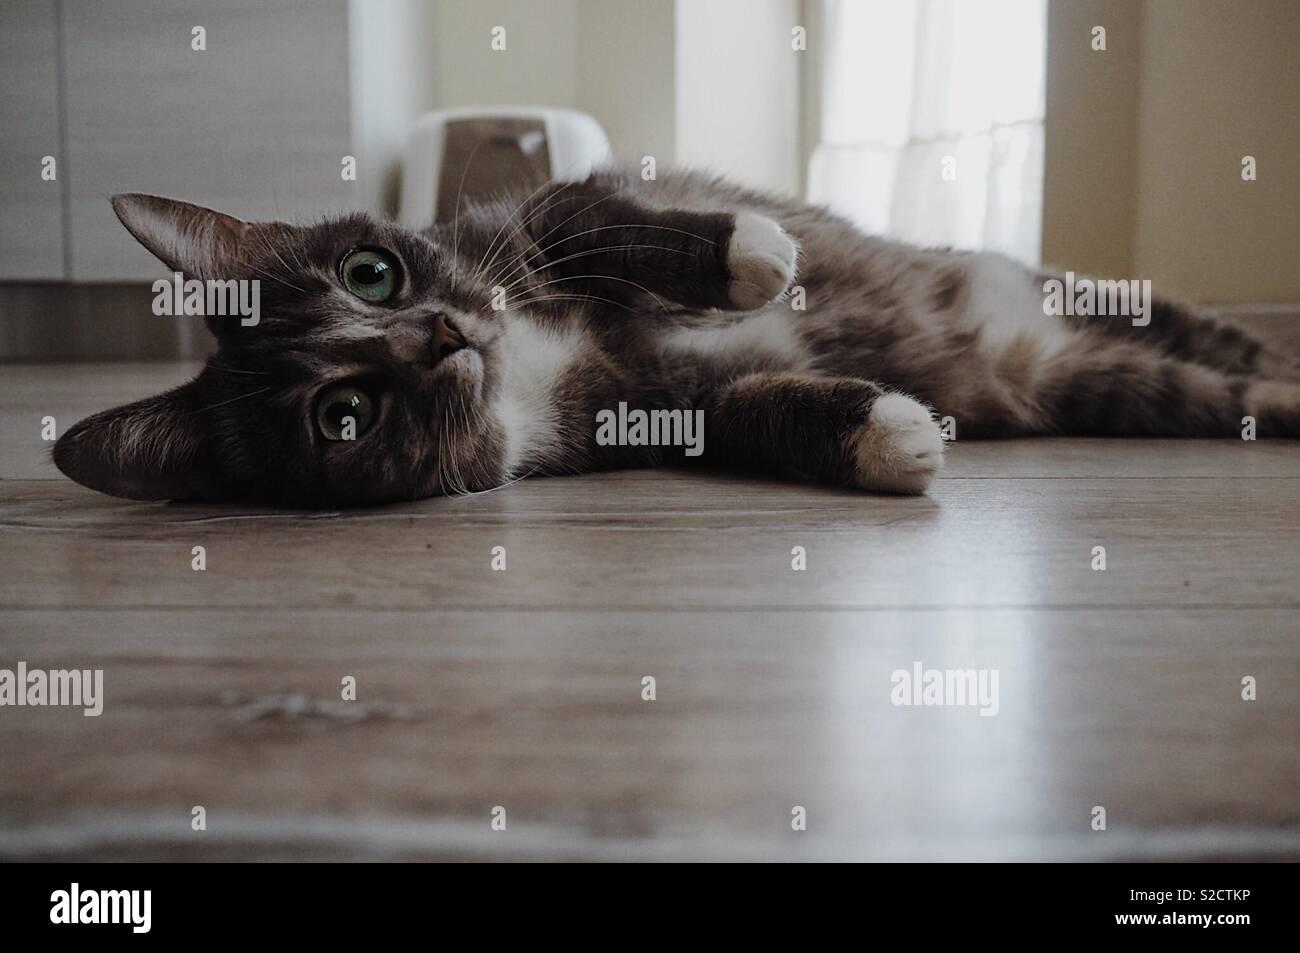 Cat lying down - Stock Image